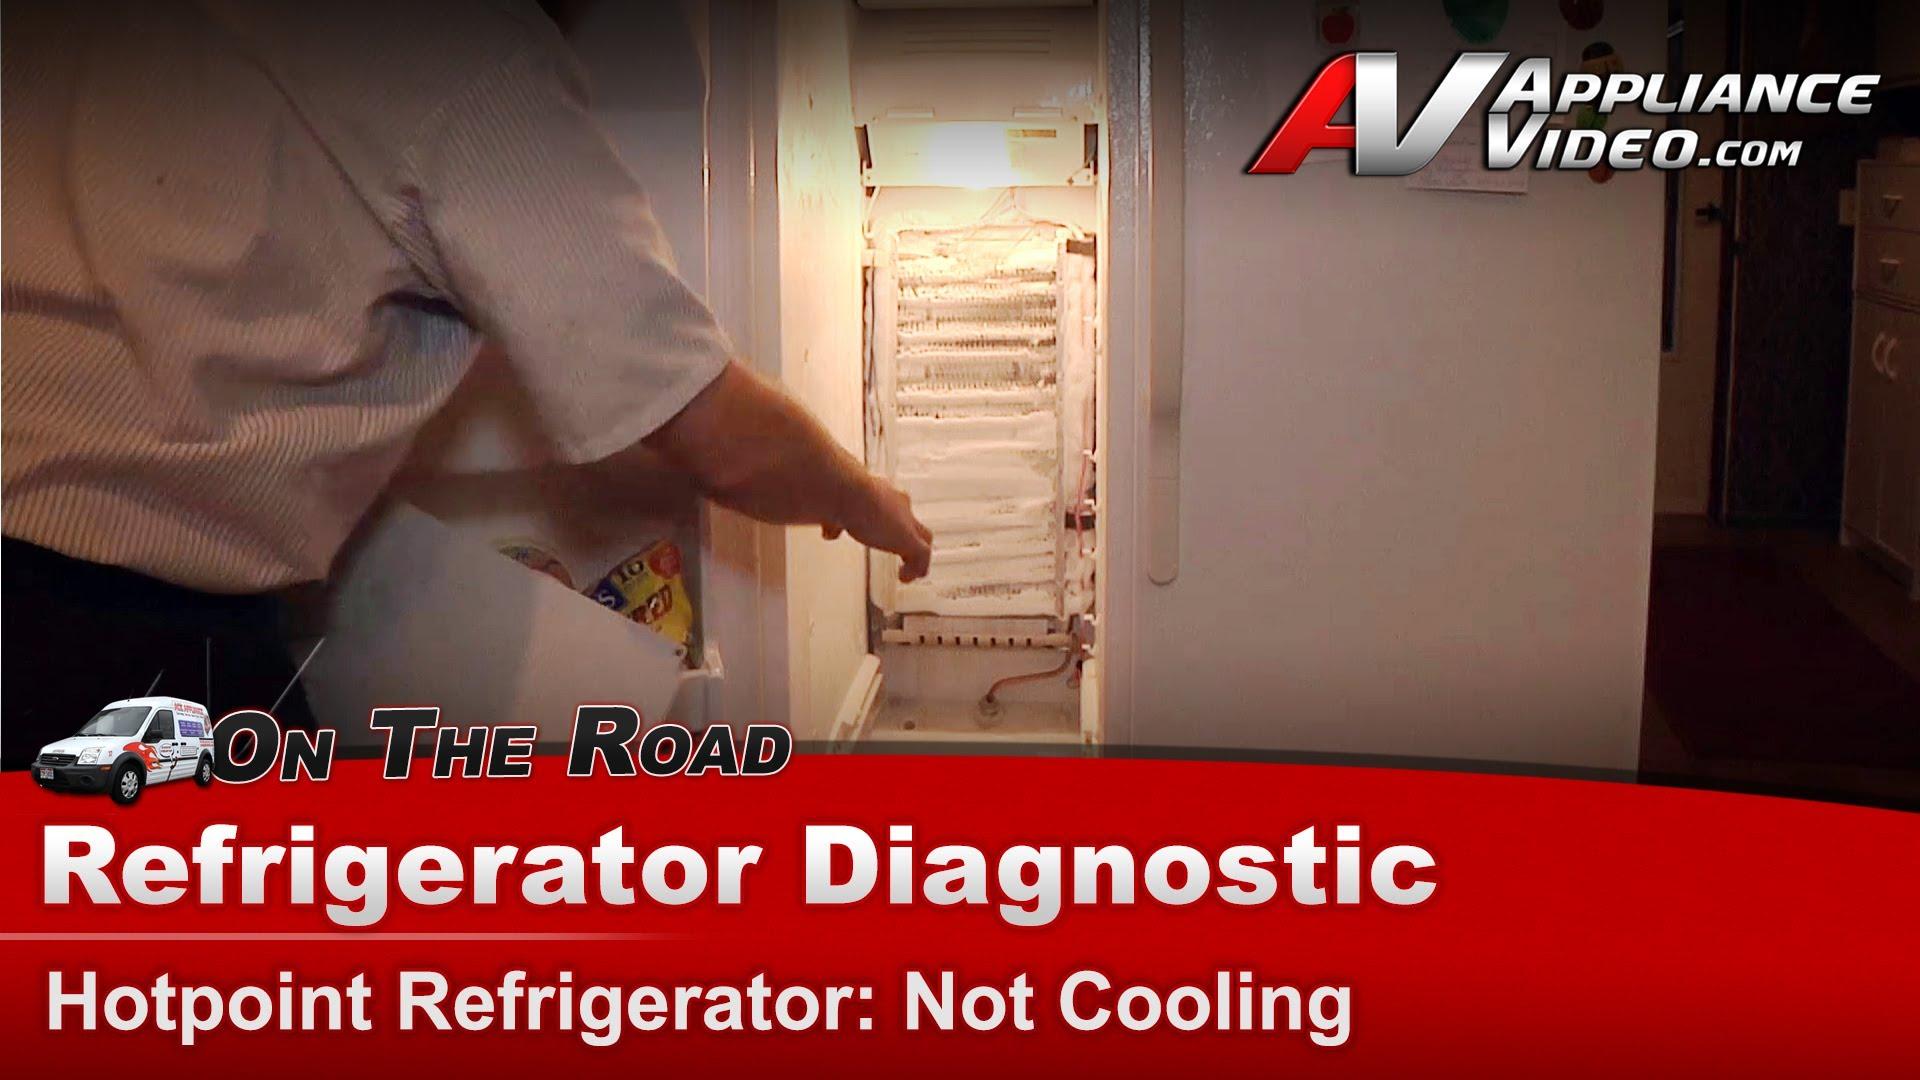 Kitchenaid Refrigerator Not Cooling Properly whirlpool maytagkitchenaidkenmoreroper sears refrigerator